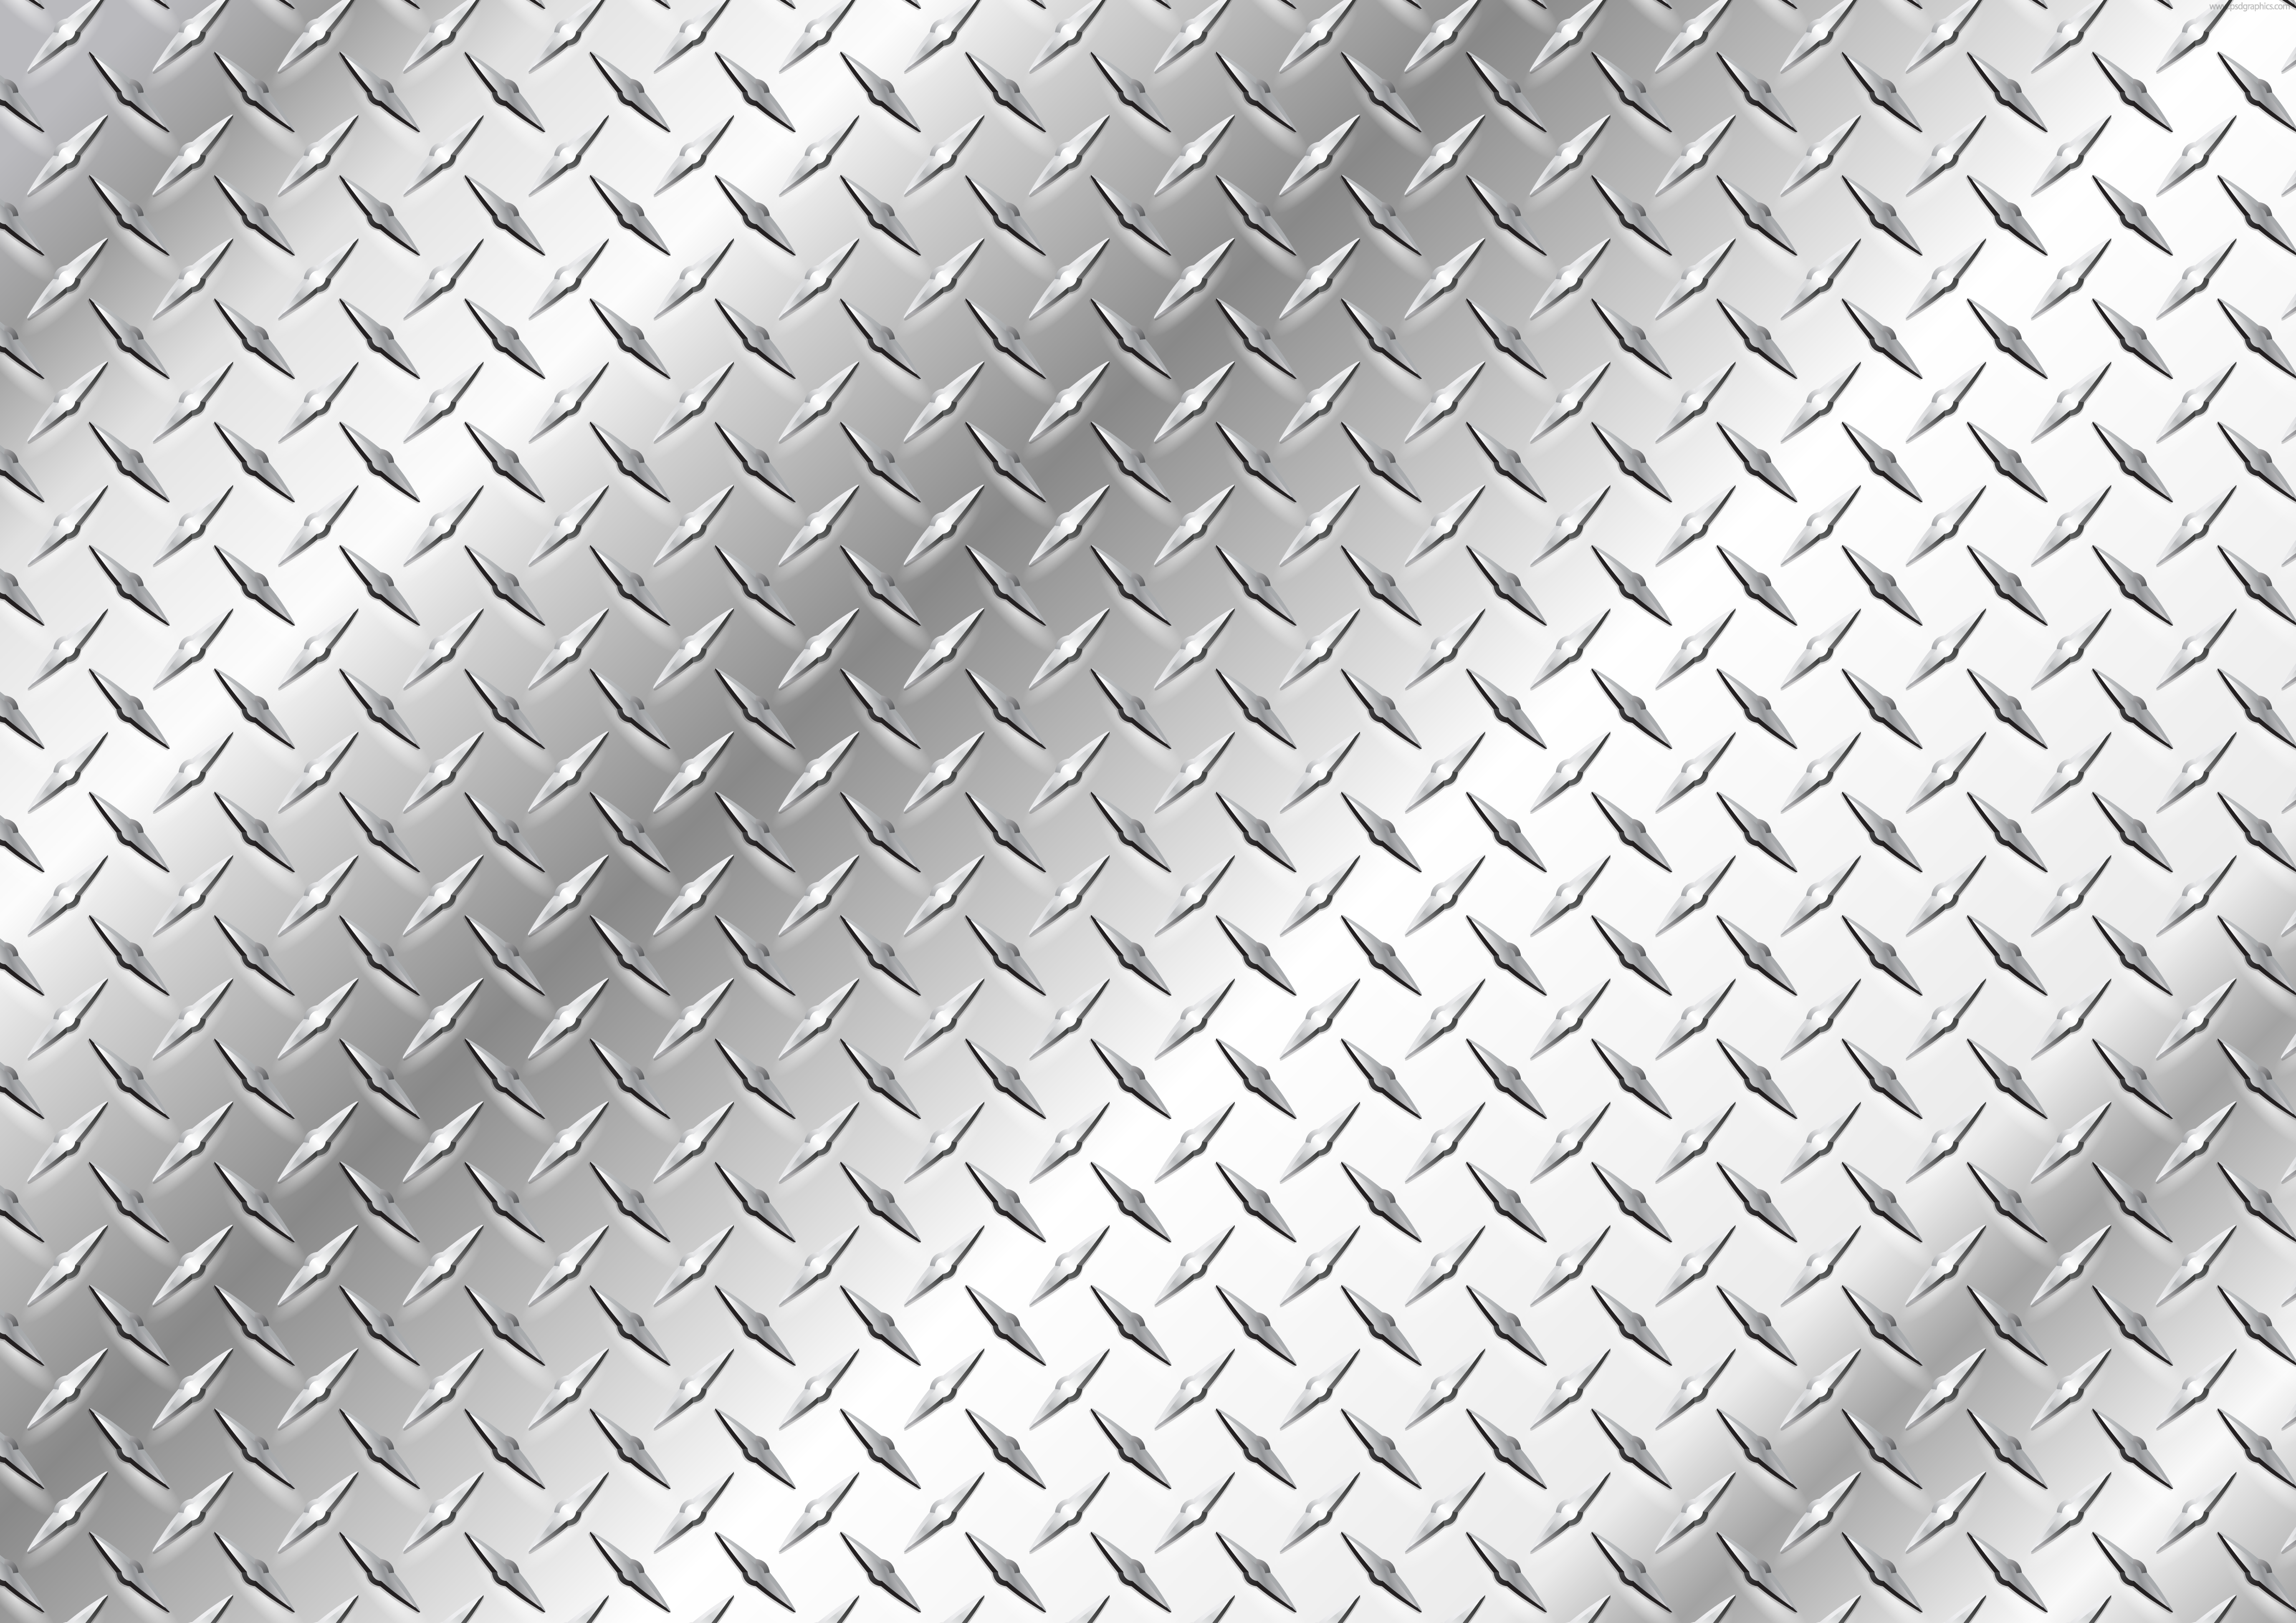 metal textures psdgraphics - photo #25